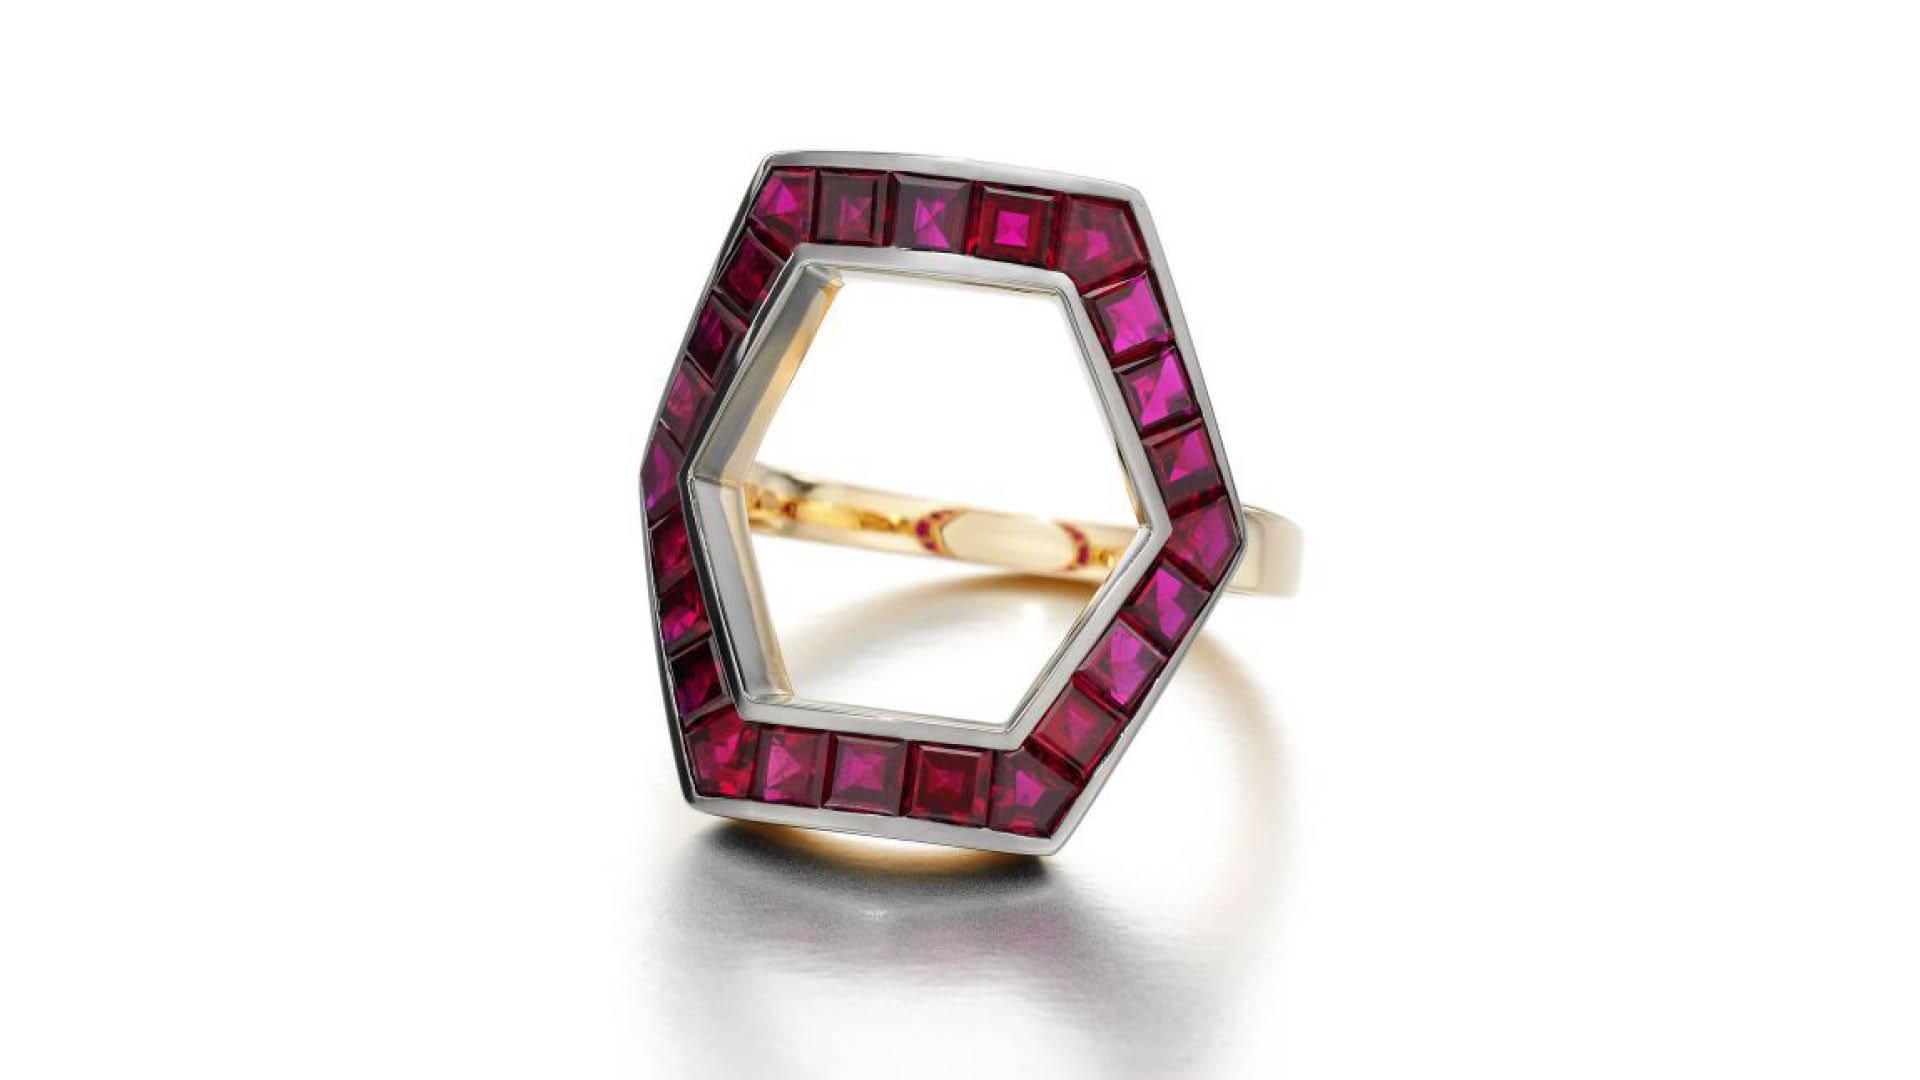 Jessica-Mccormack_Hexagonal-Ruby-Ring